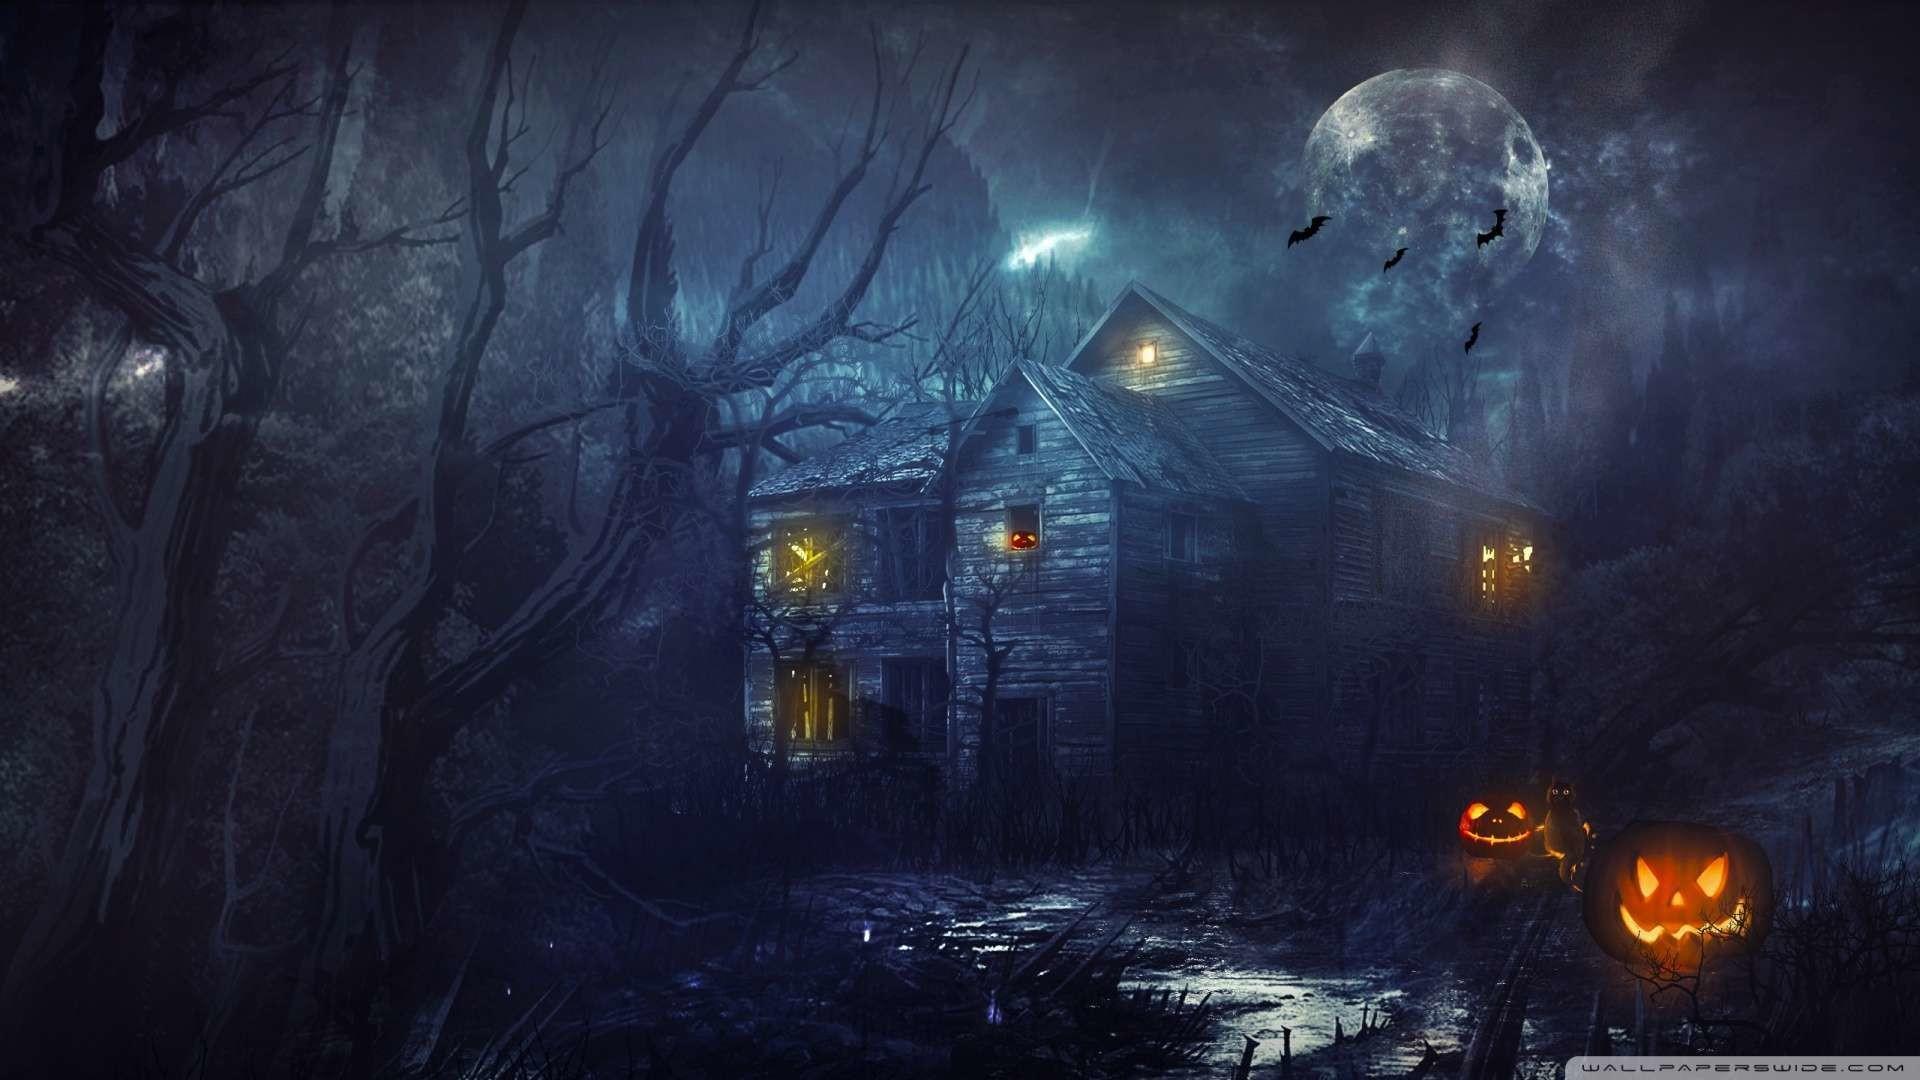 Popular Wallpaper Mac Halloween - 1137438-hd-halloween-wallpapers-1080p-1920x1080-for-mac  Trends_934072.jpg